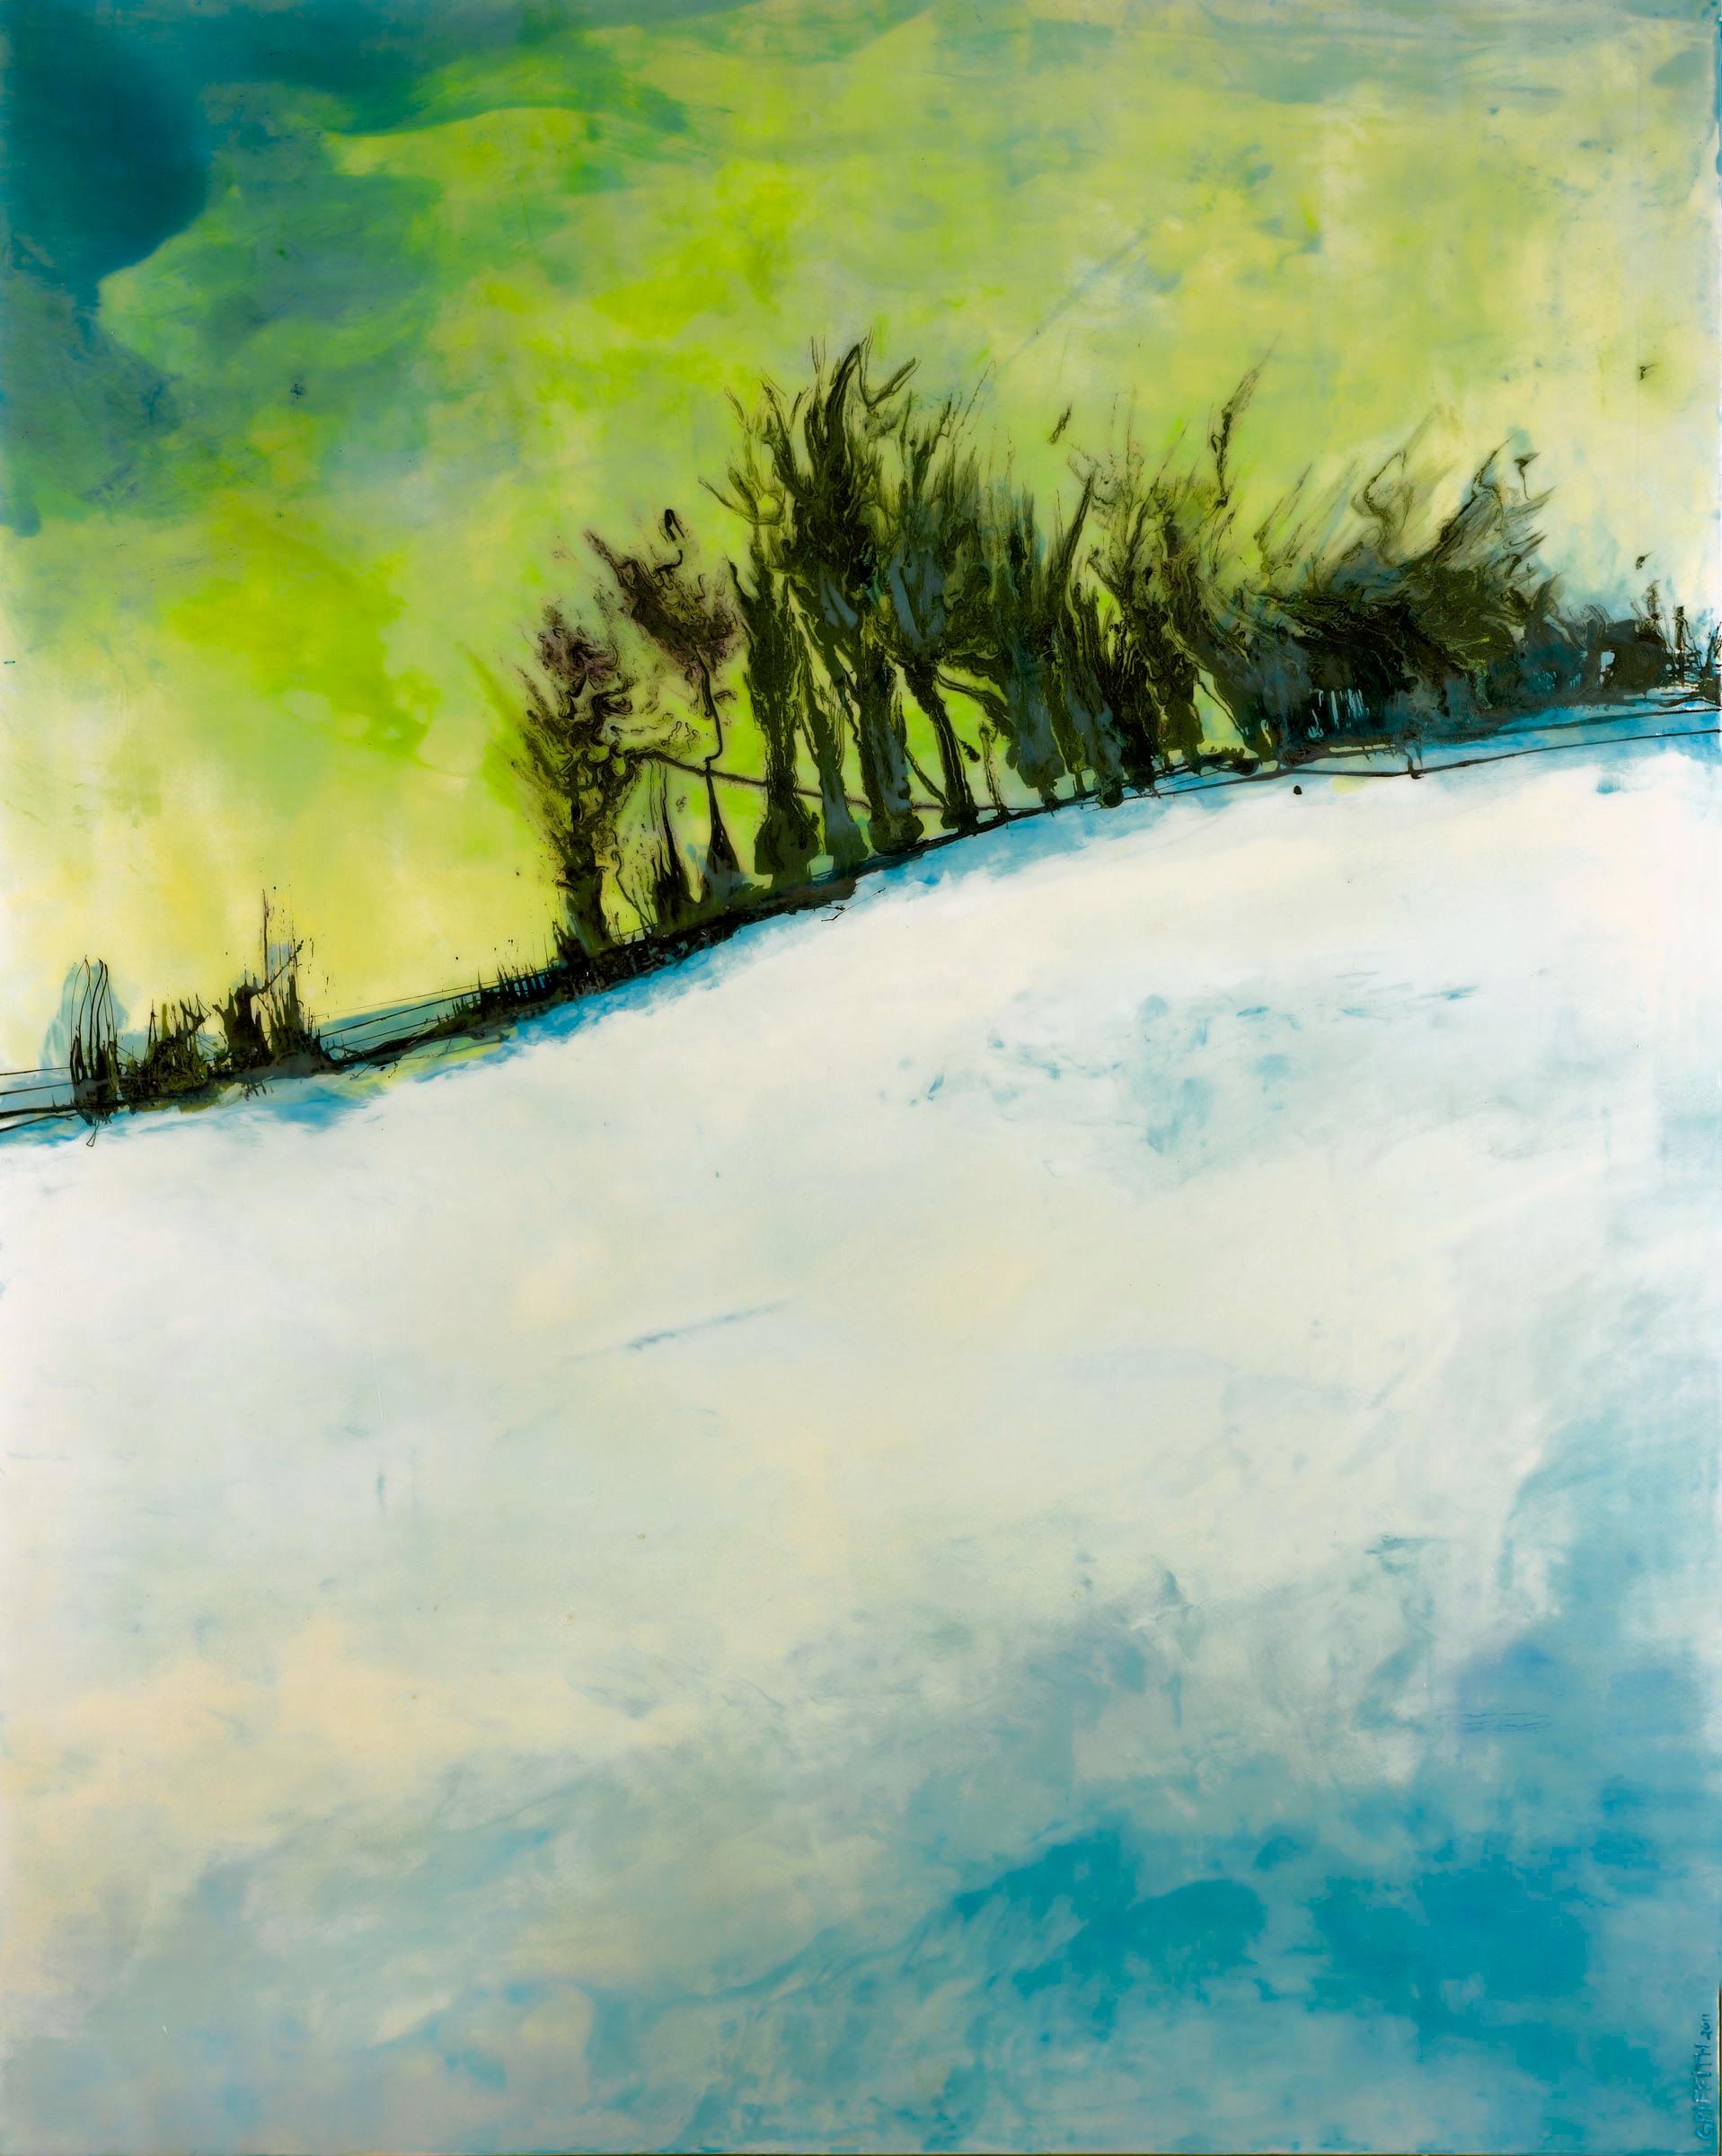 """Winter Ridge""                                            48"" x 60"" acrylic & resin on canvas   - SOLD"